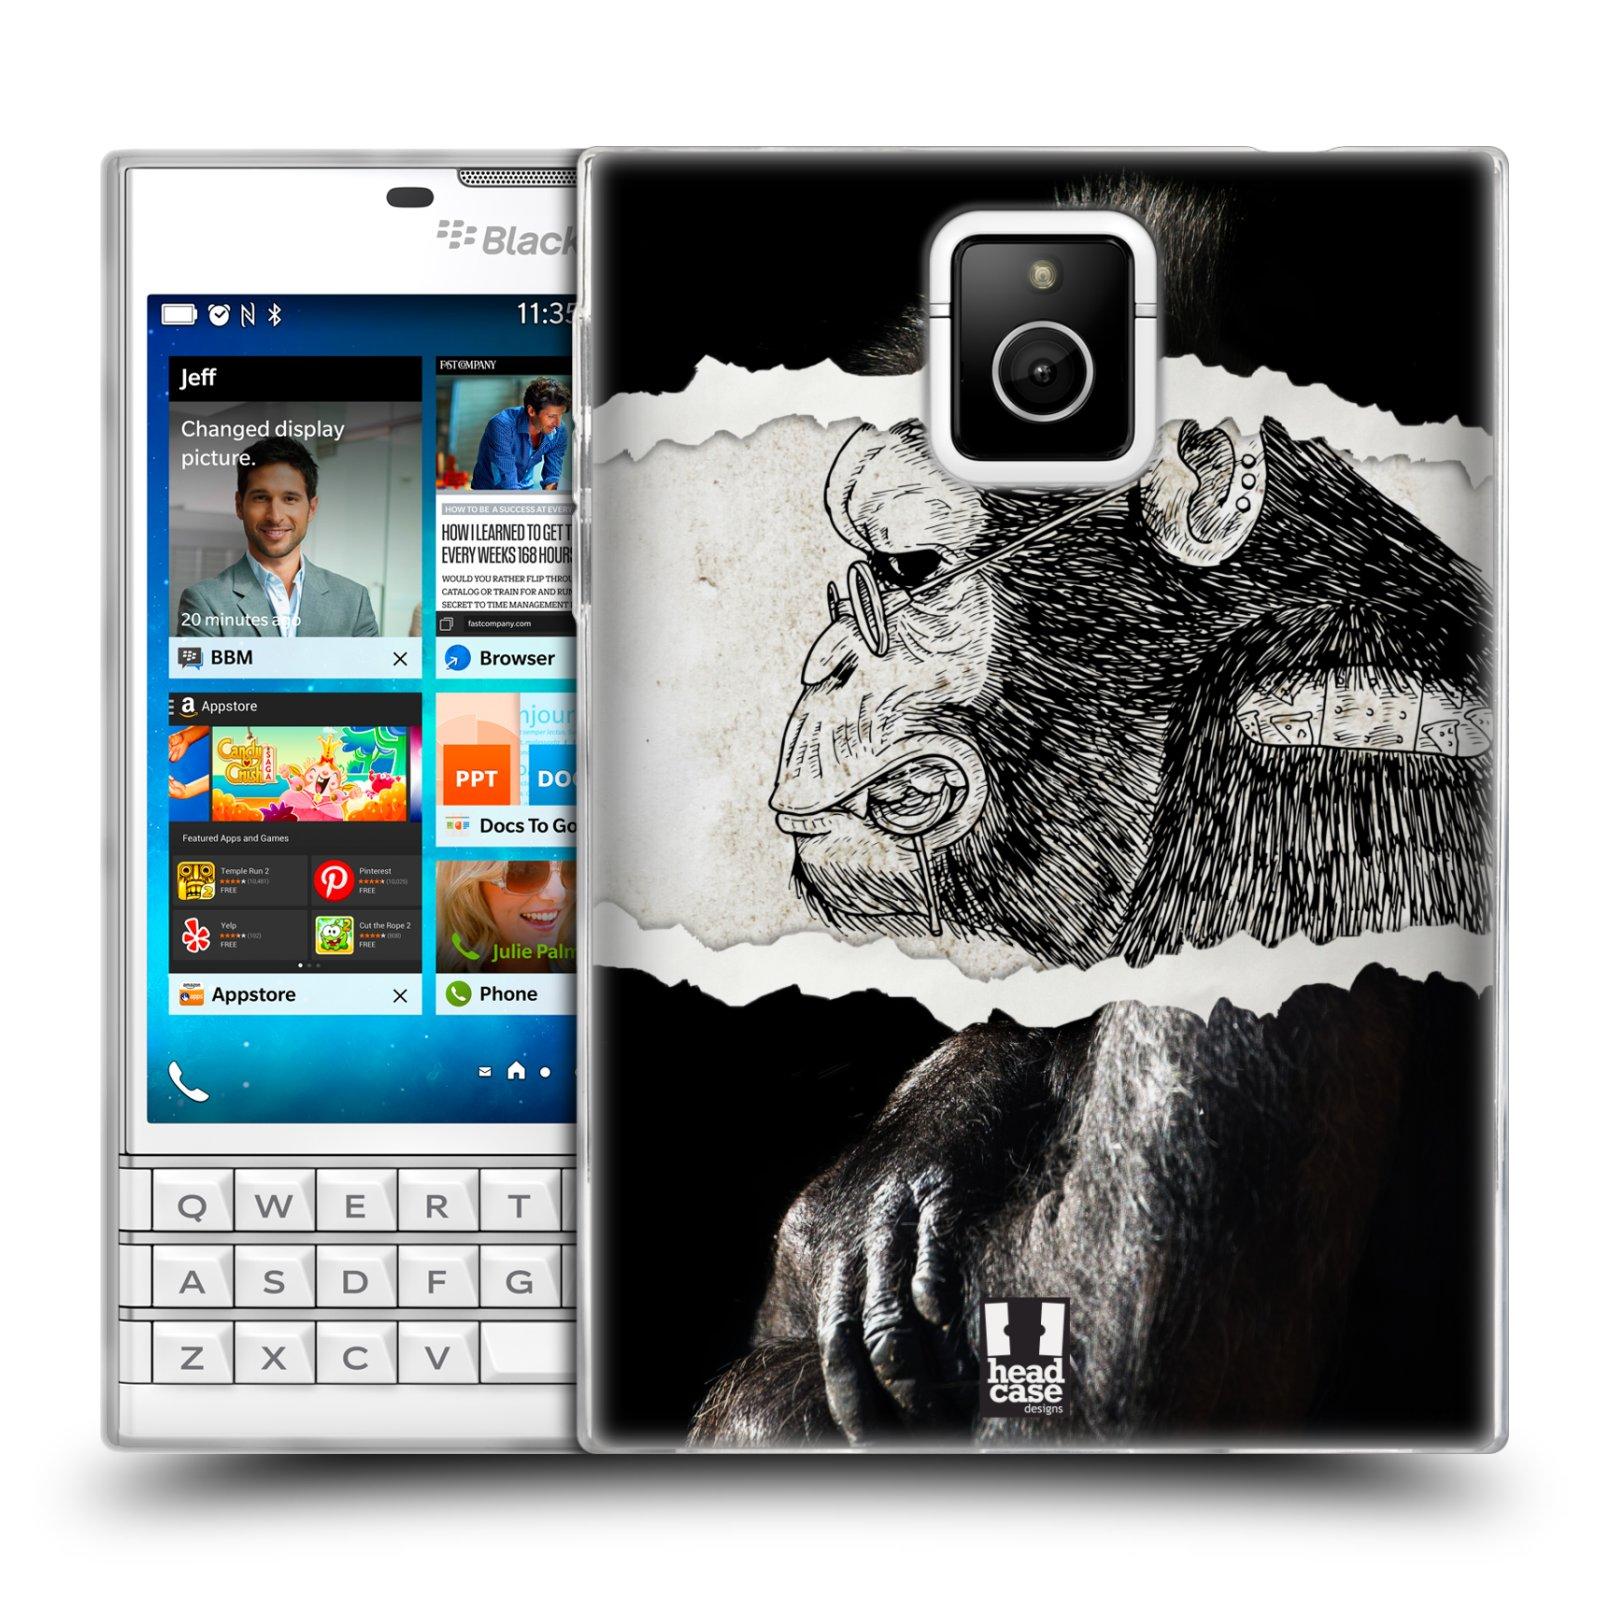 HEAD CASE silikonový obal na mobil Blackberry PASSPORT vzor zvířata koláž opice